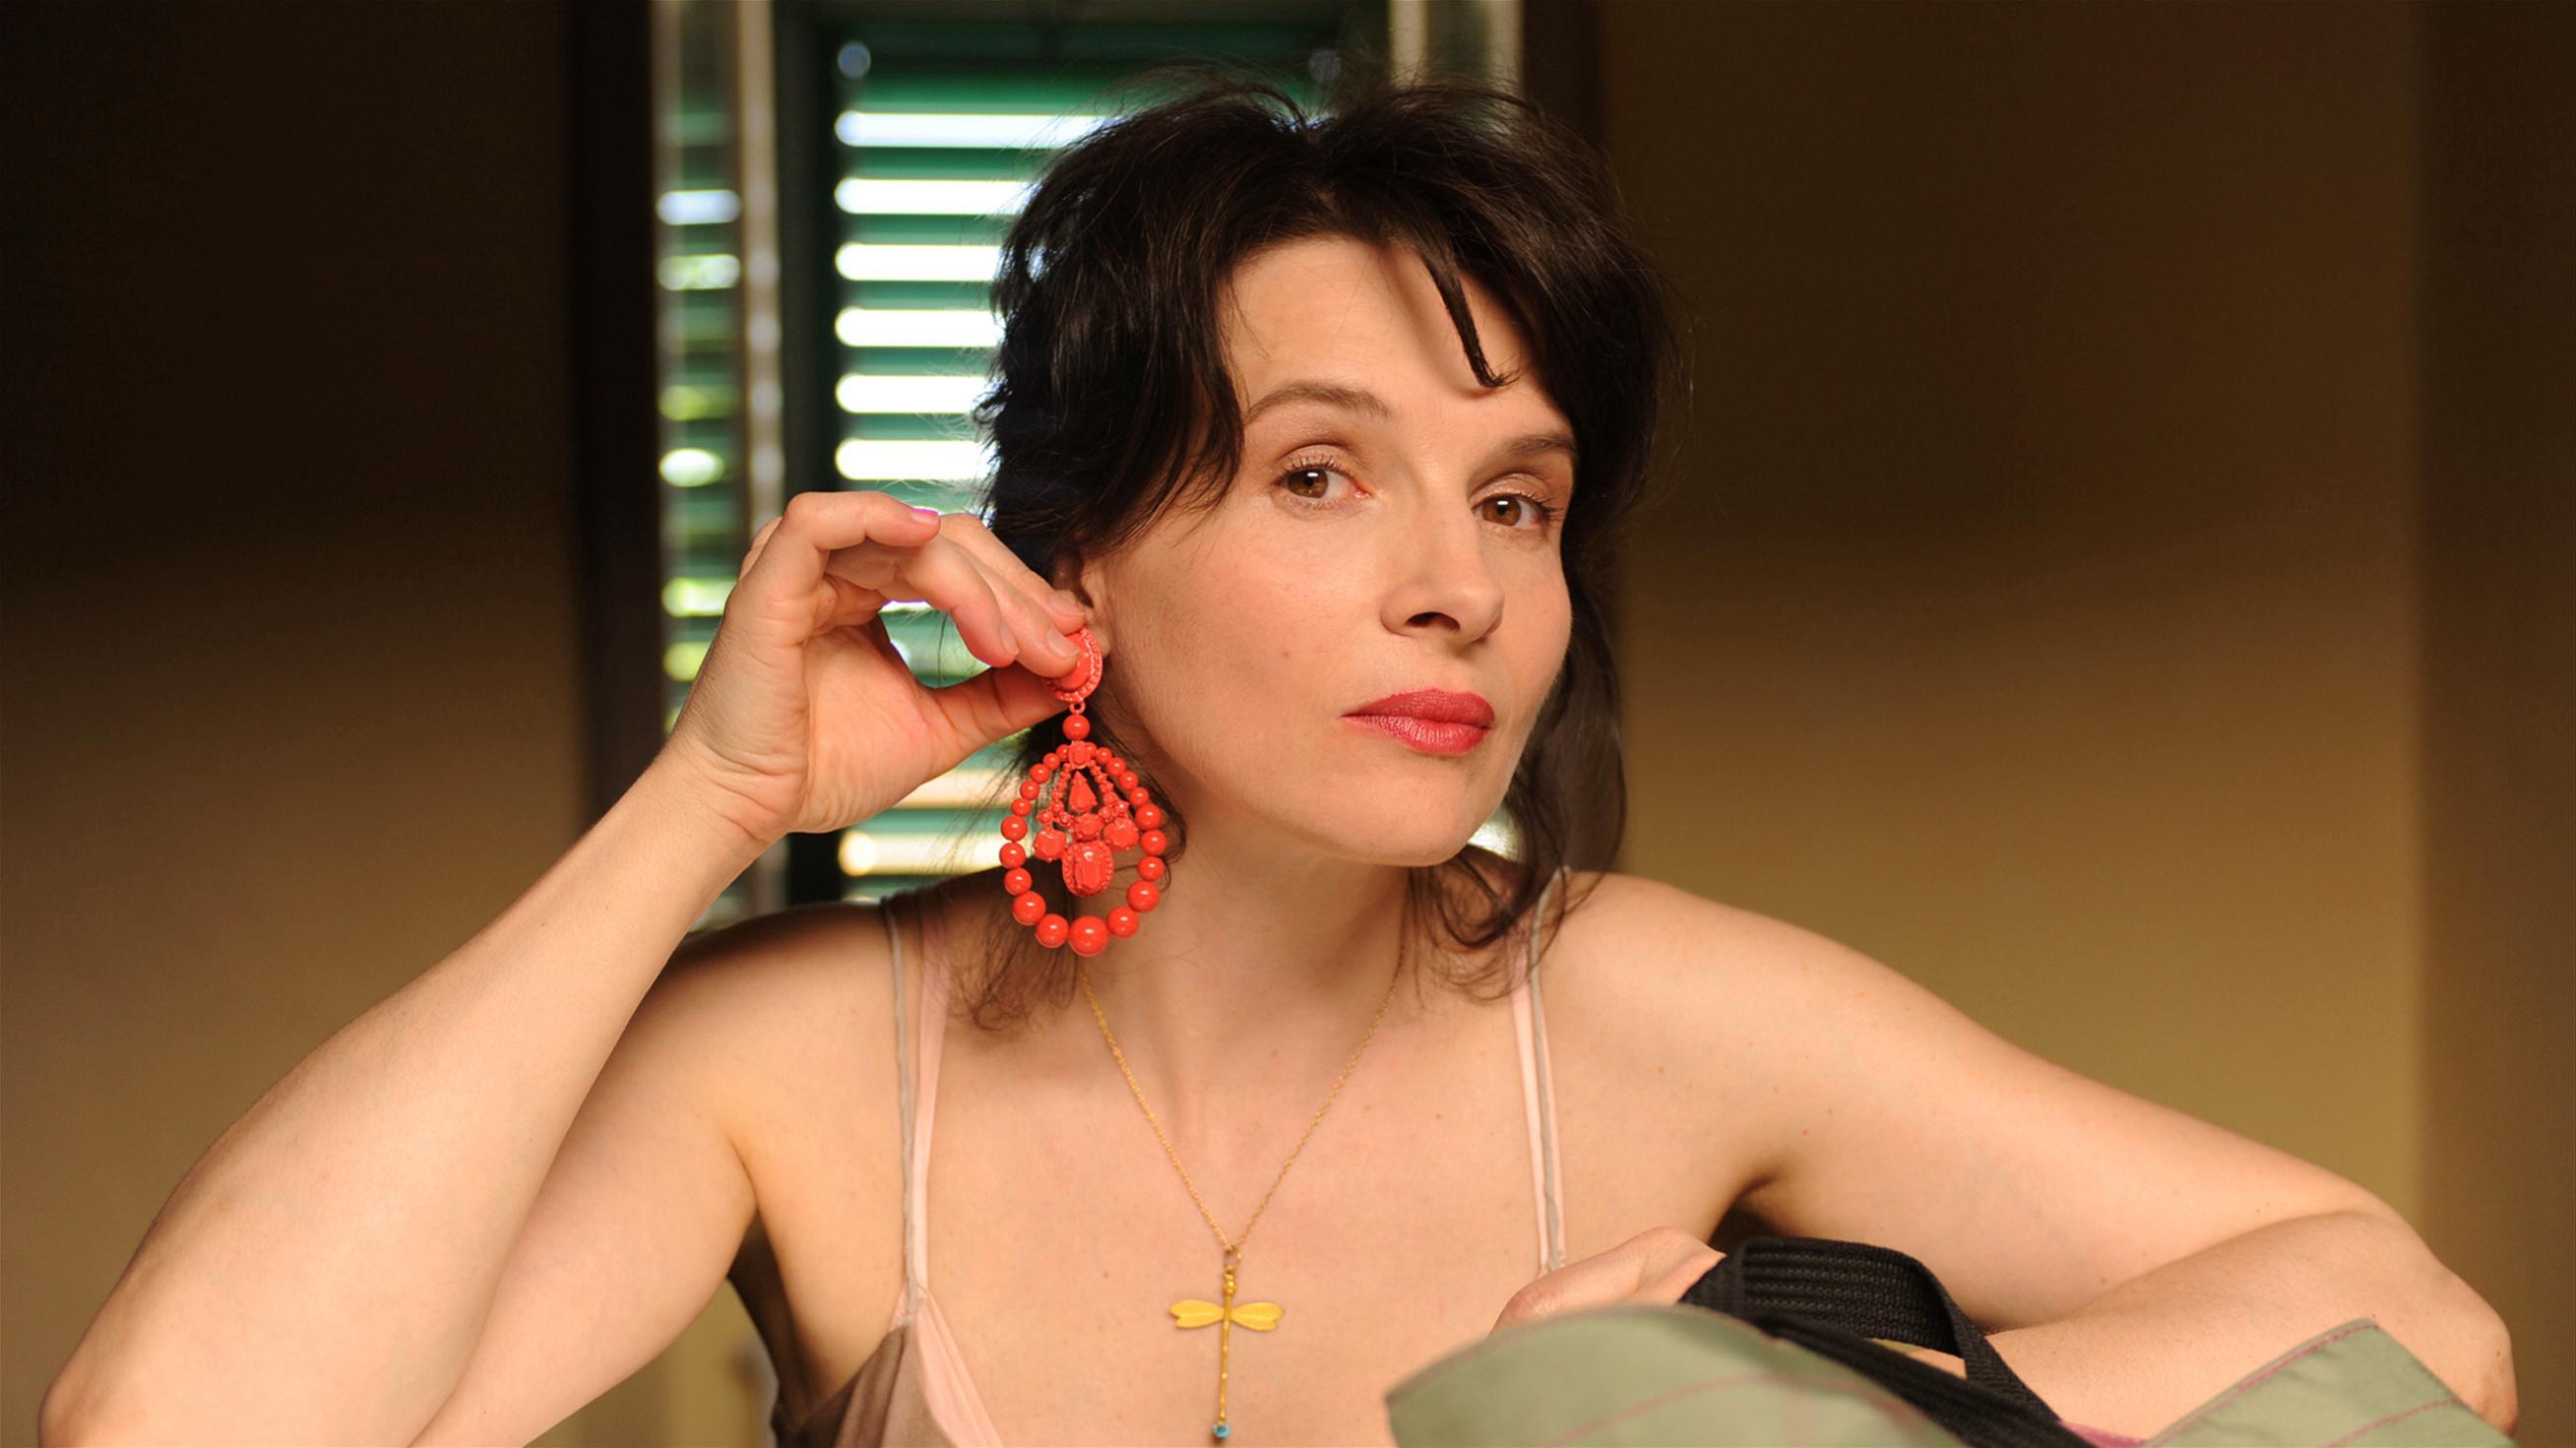 Streaming: the infinite variety of Juliette Binoche